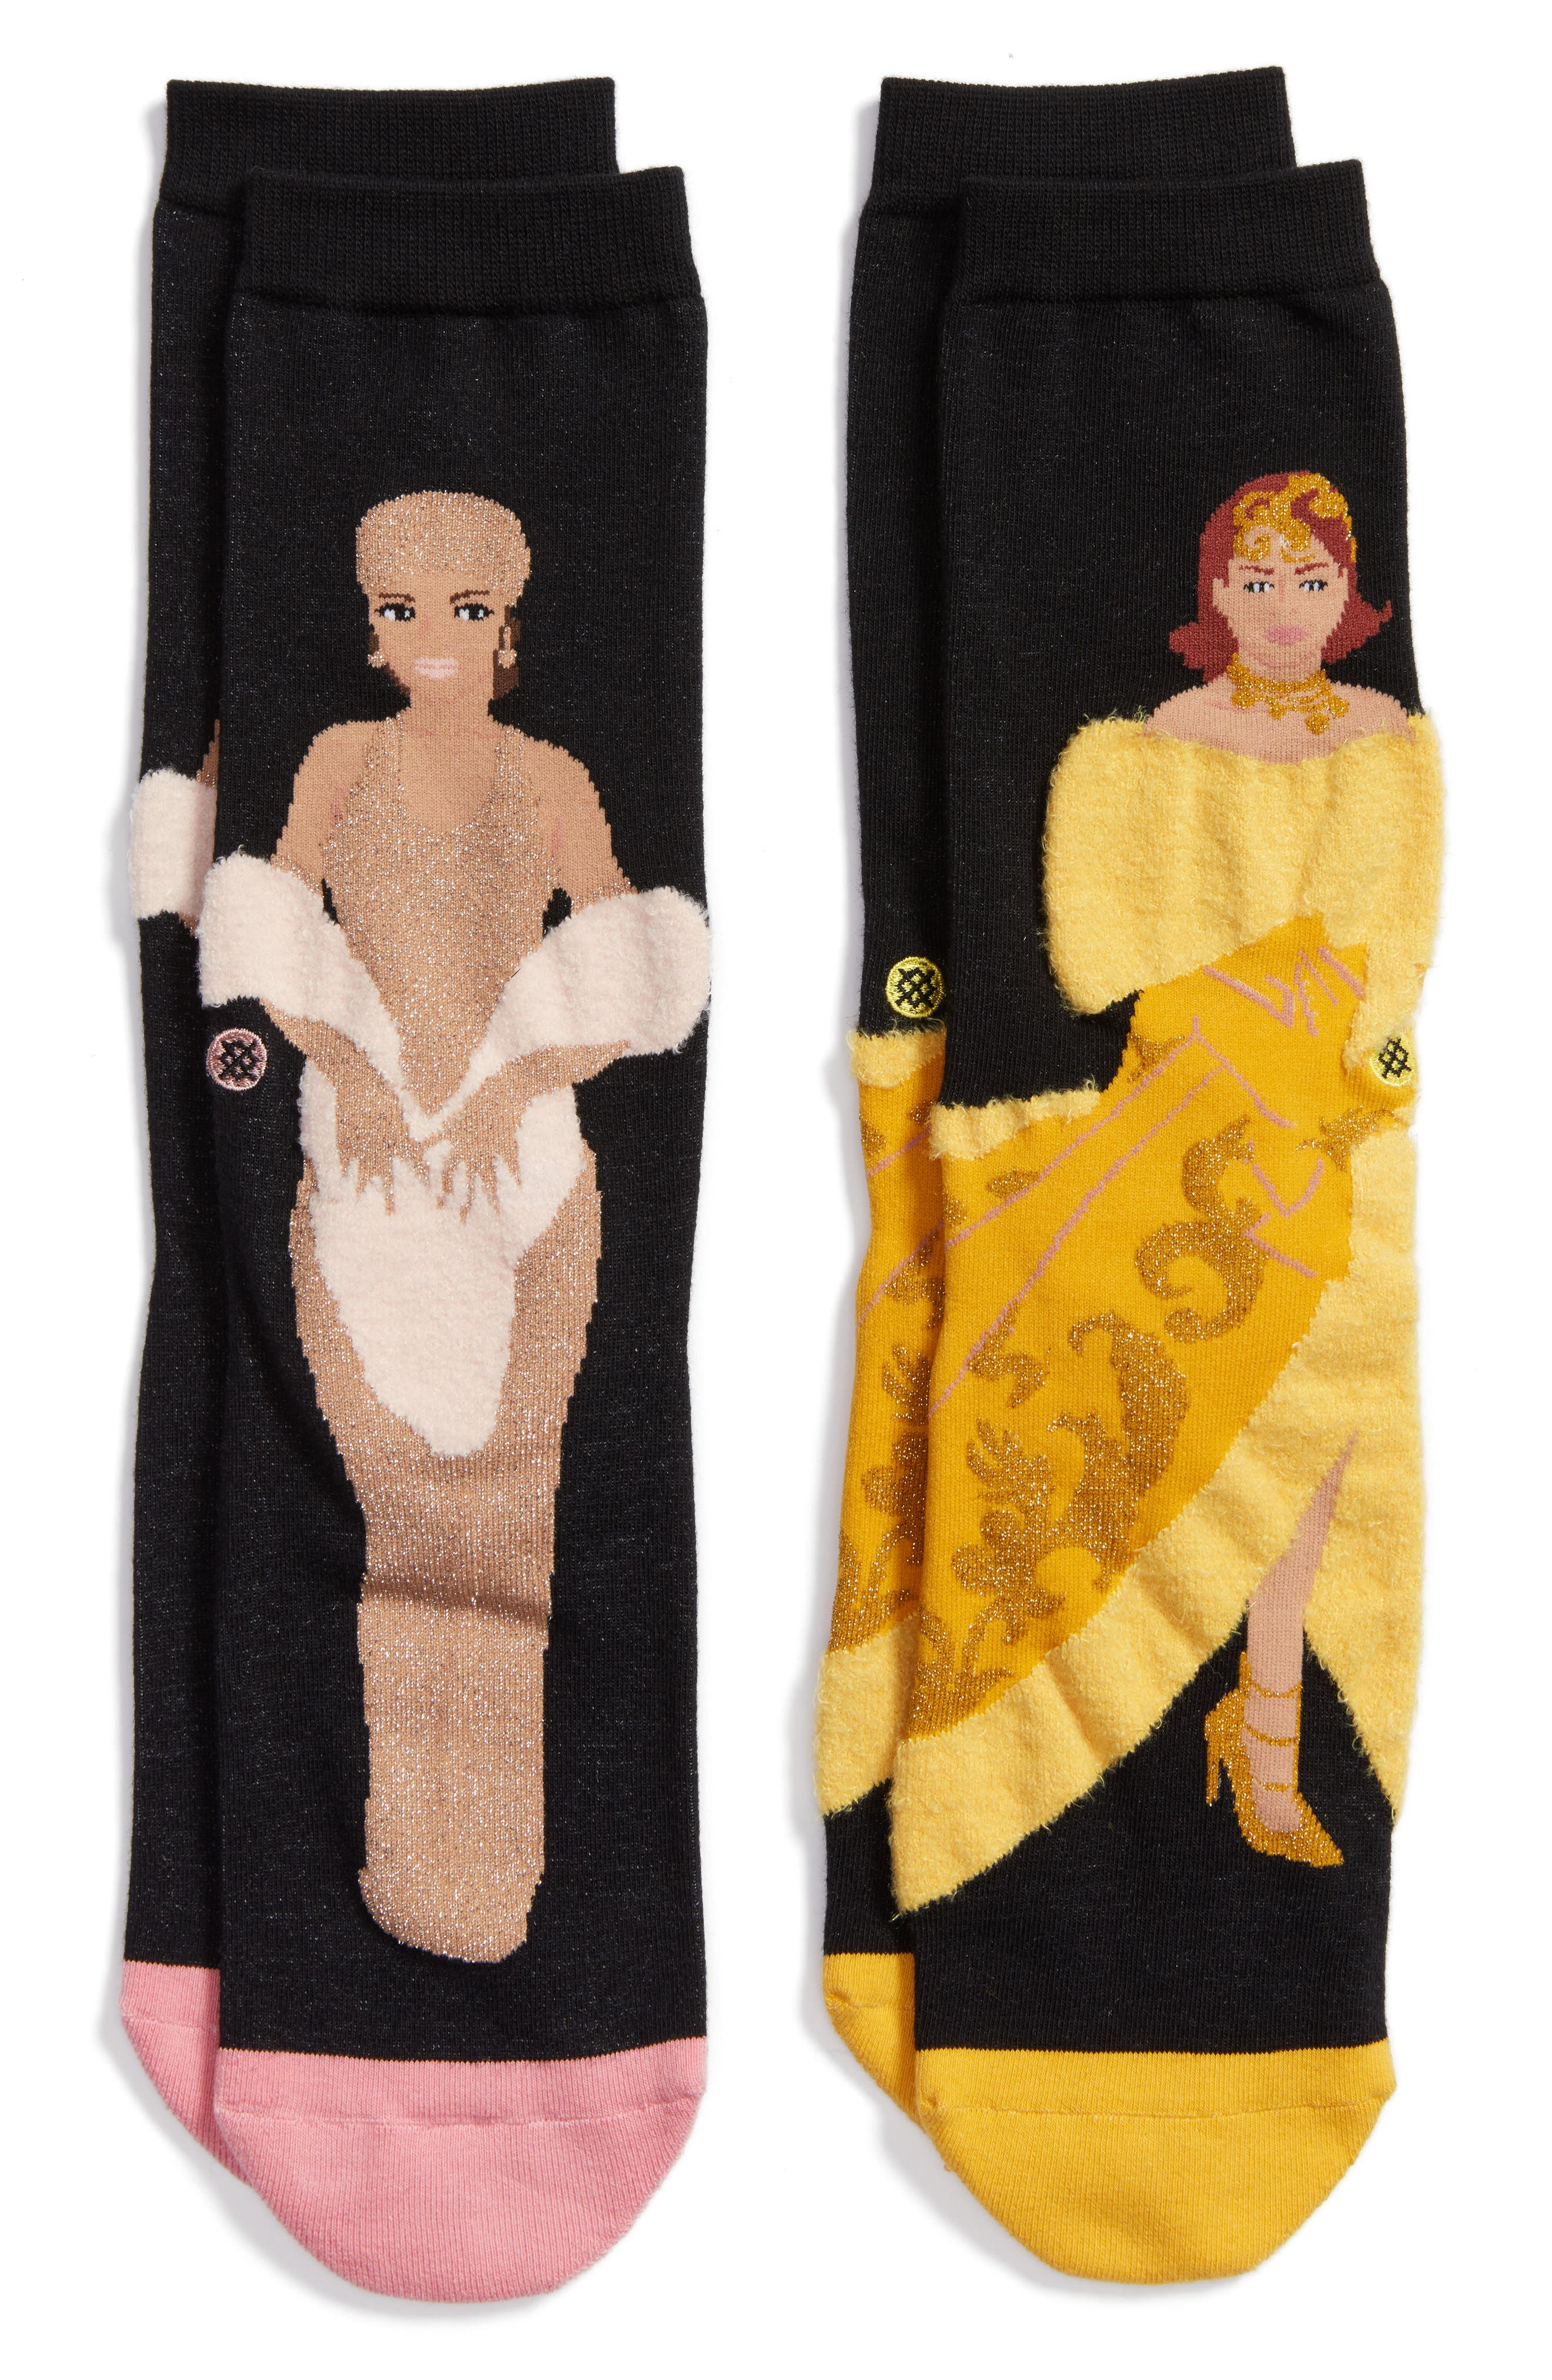 Stance x Rihanna Awards Show 2-Pack Crew Socks